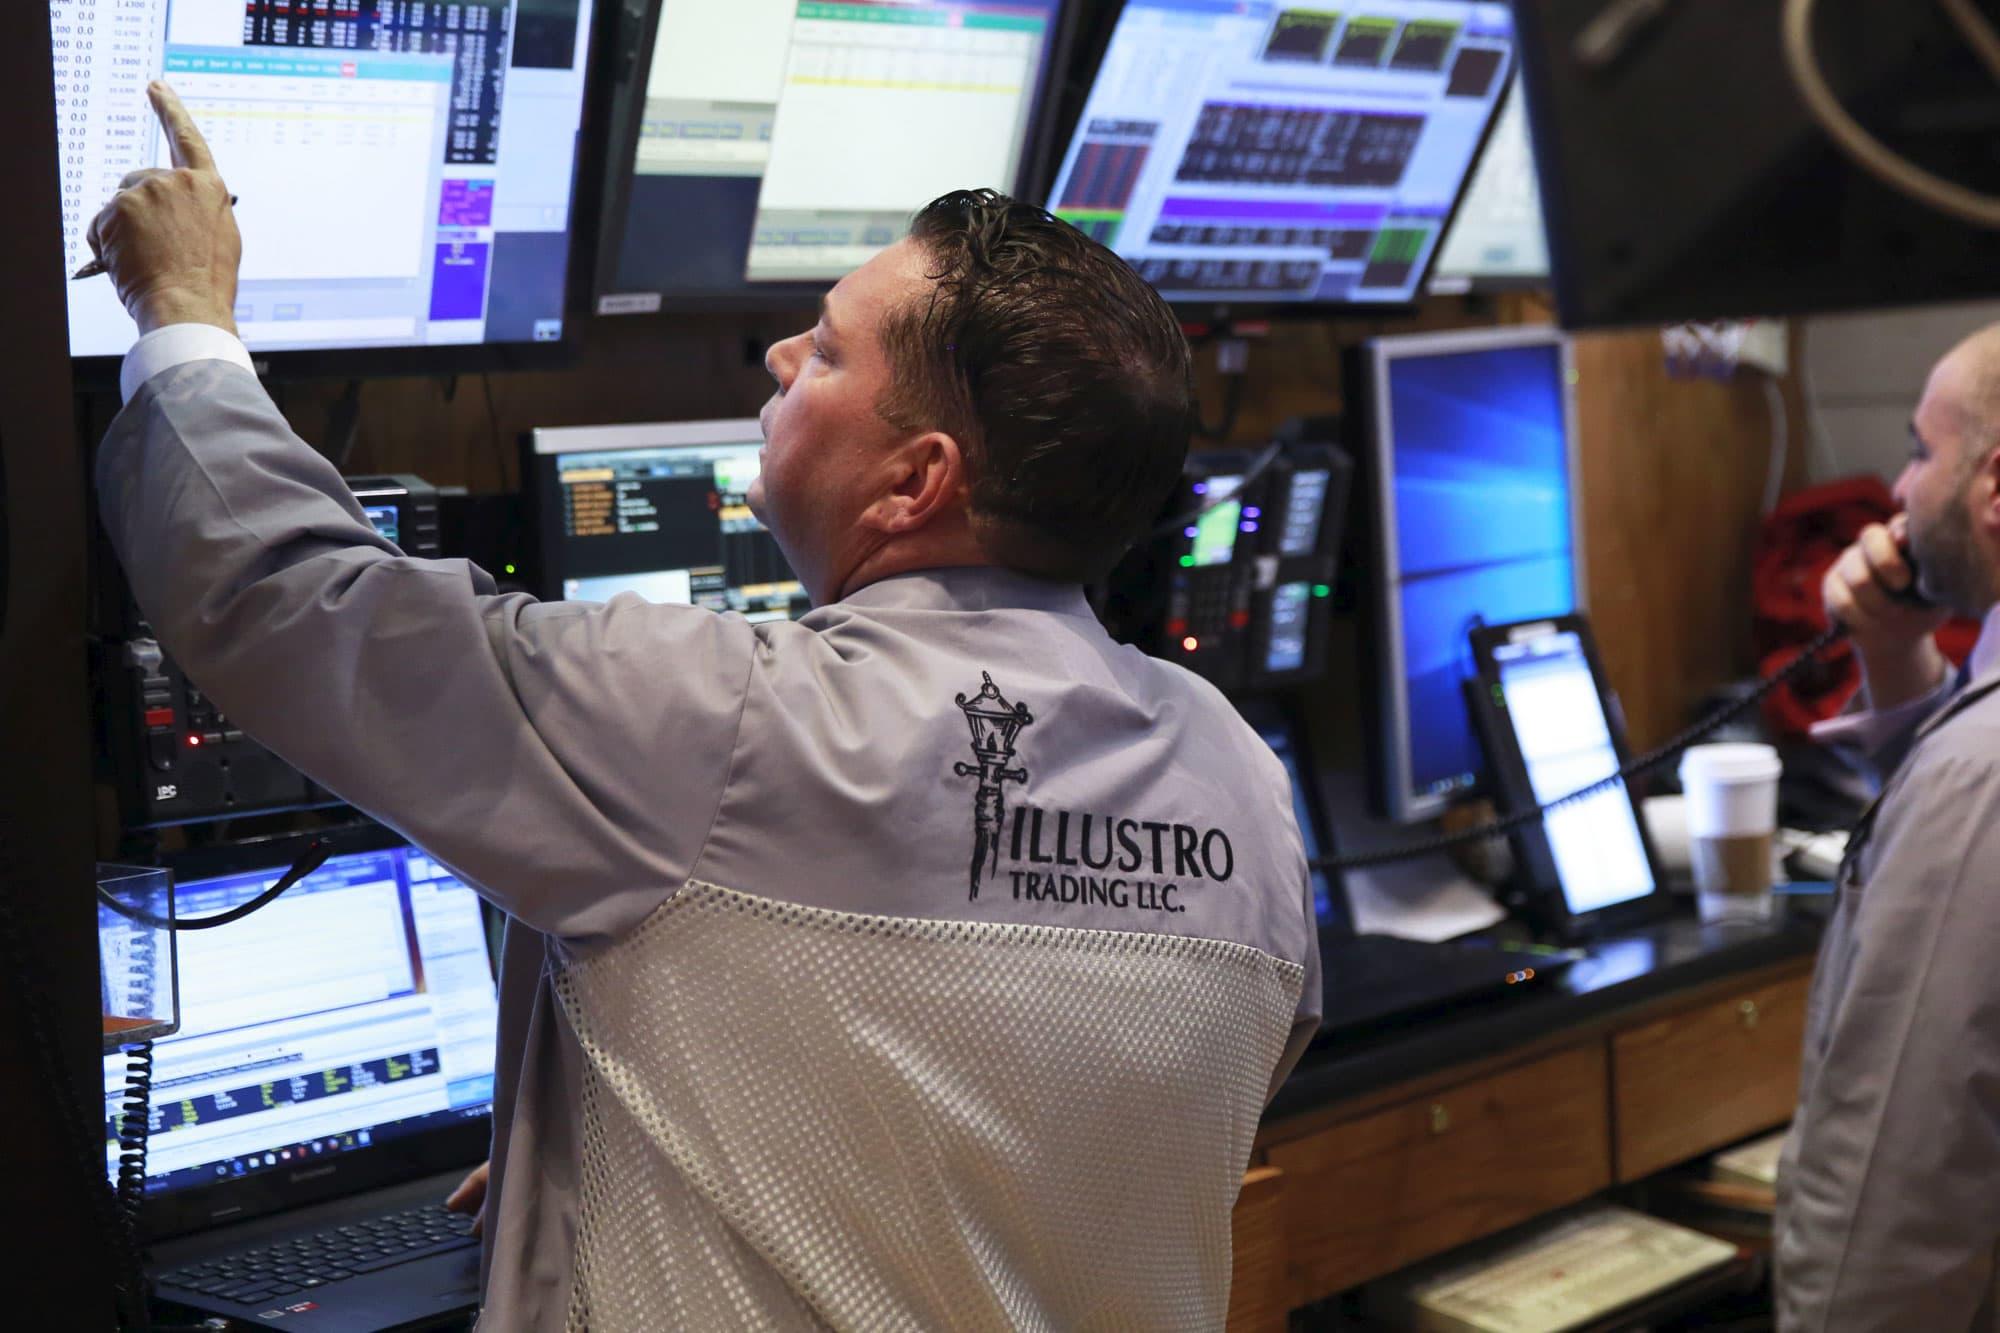 Nasdaq 100 futures down 1% as Apple falls on earnings